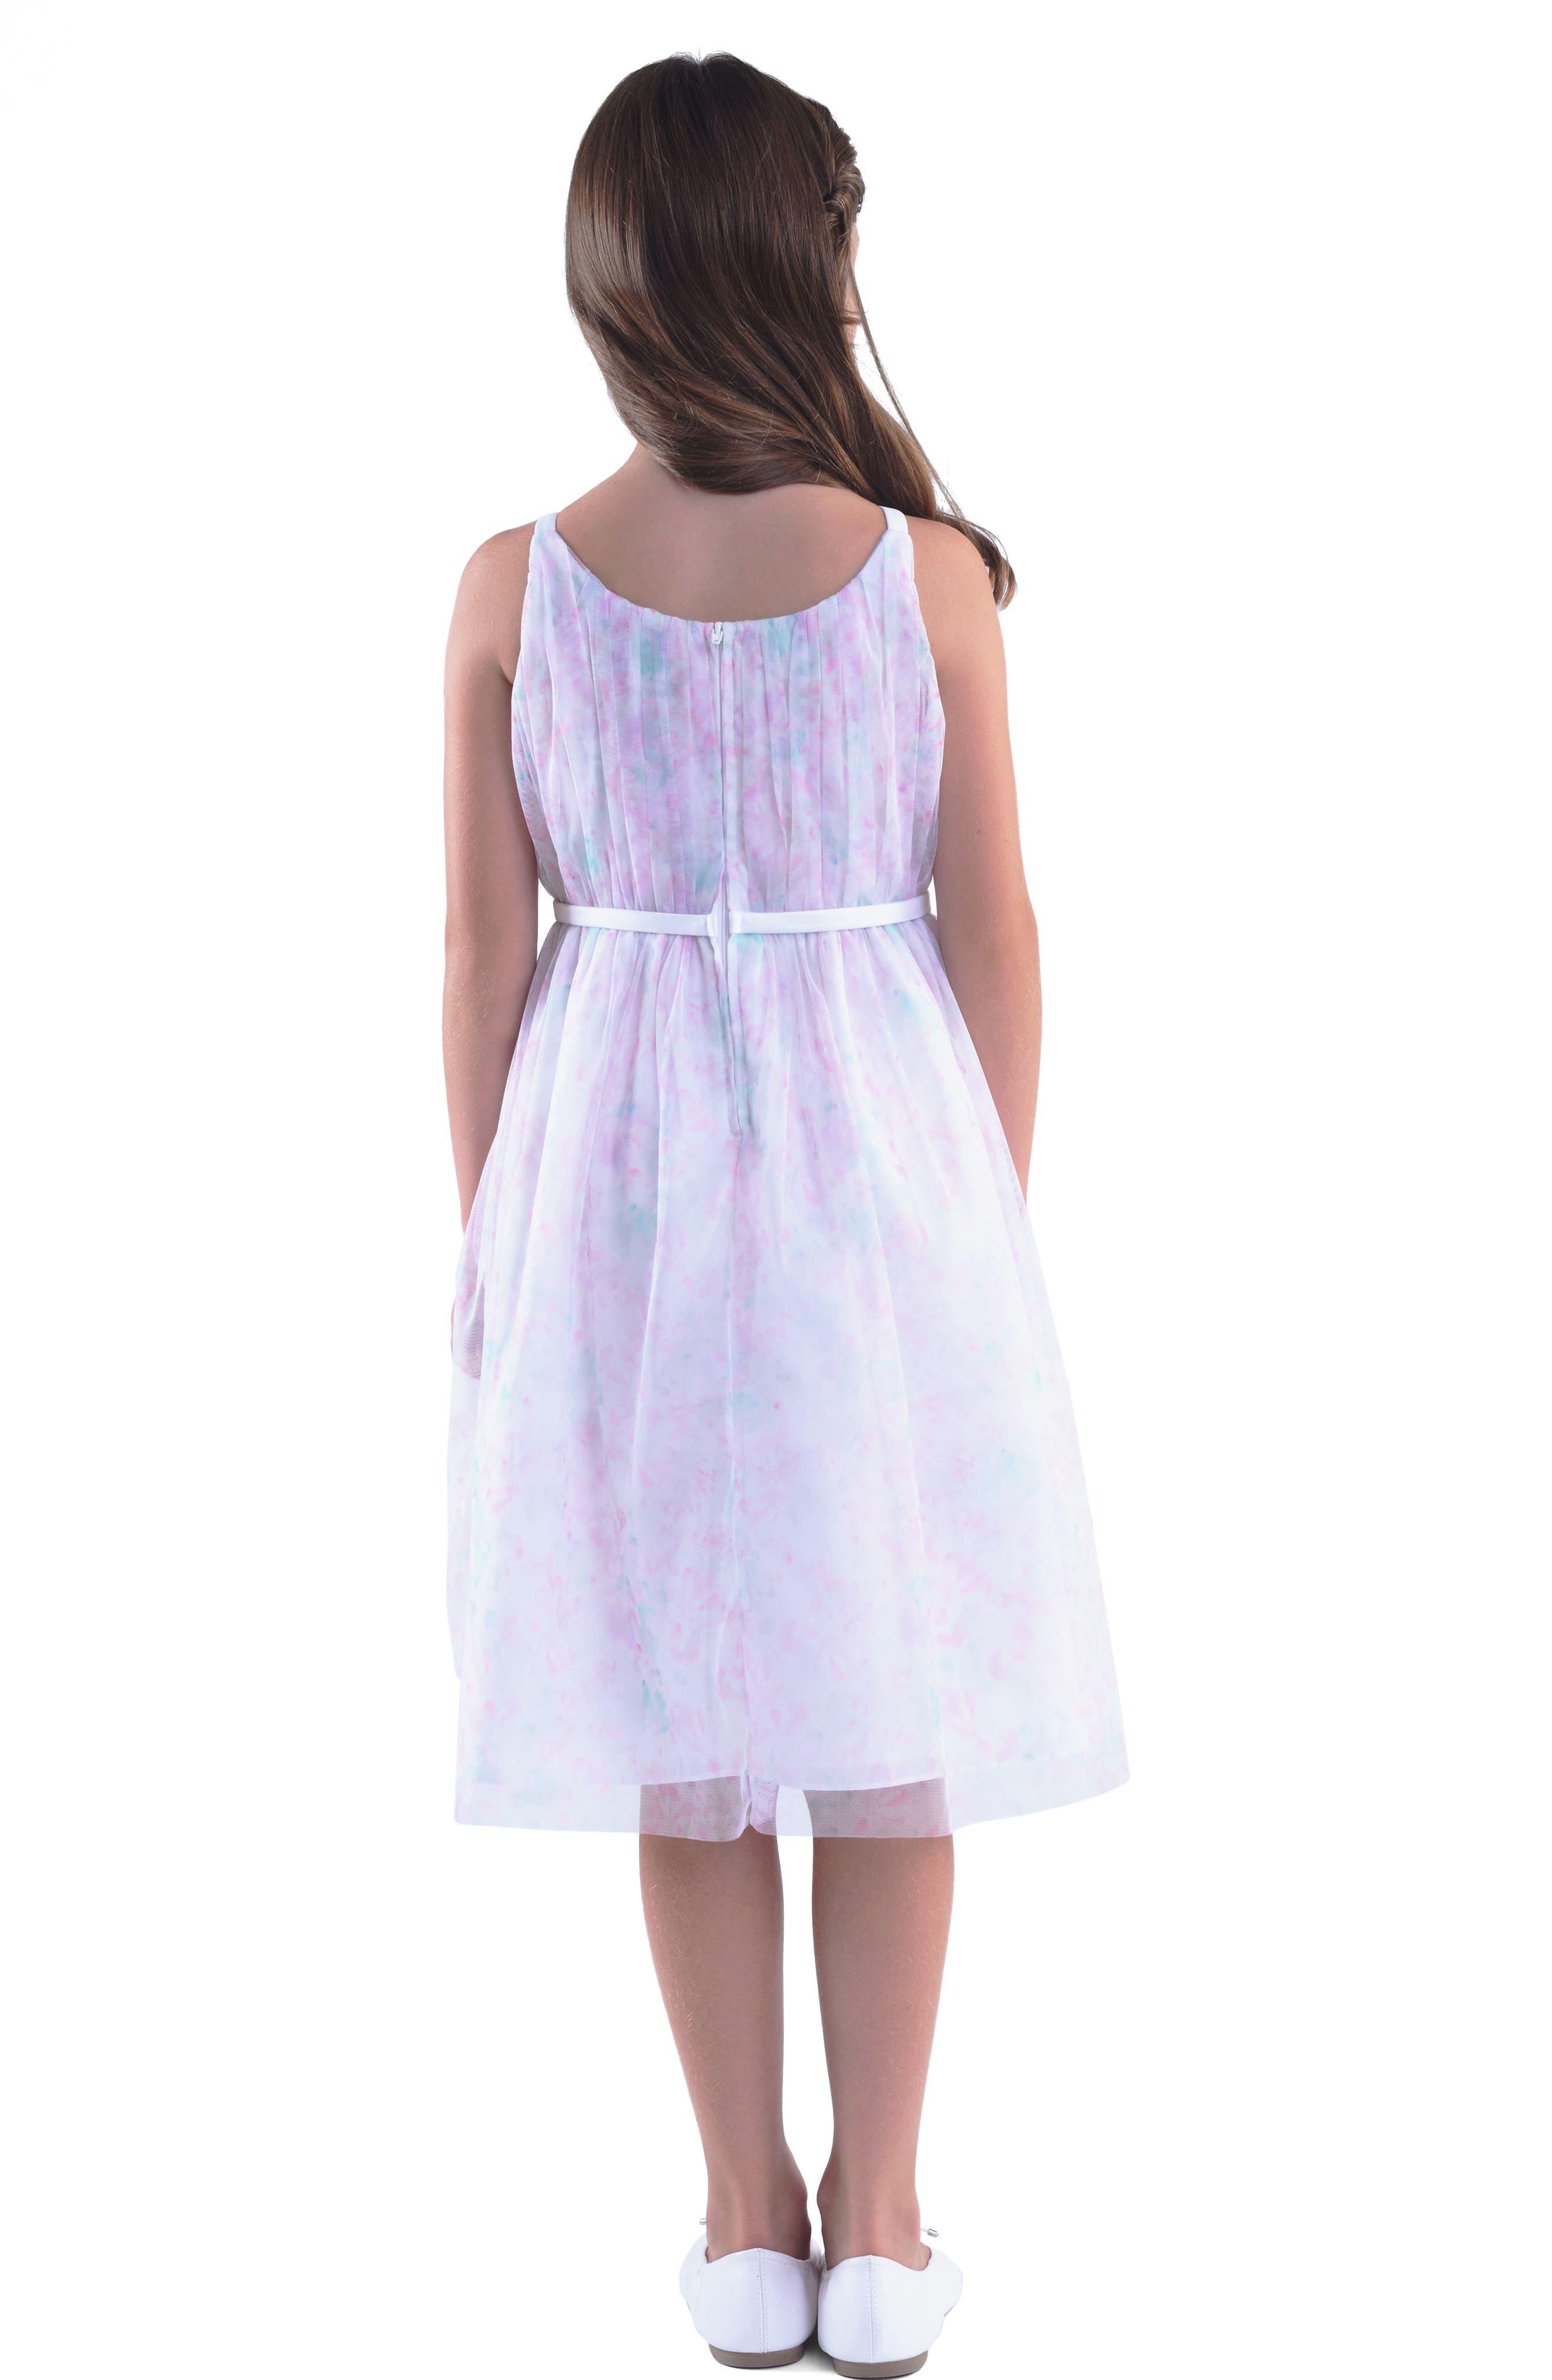 Floral Print Sleeveless Dress,                             Alternate thumbnail 2, color,                             650